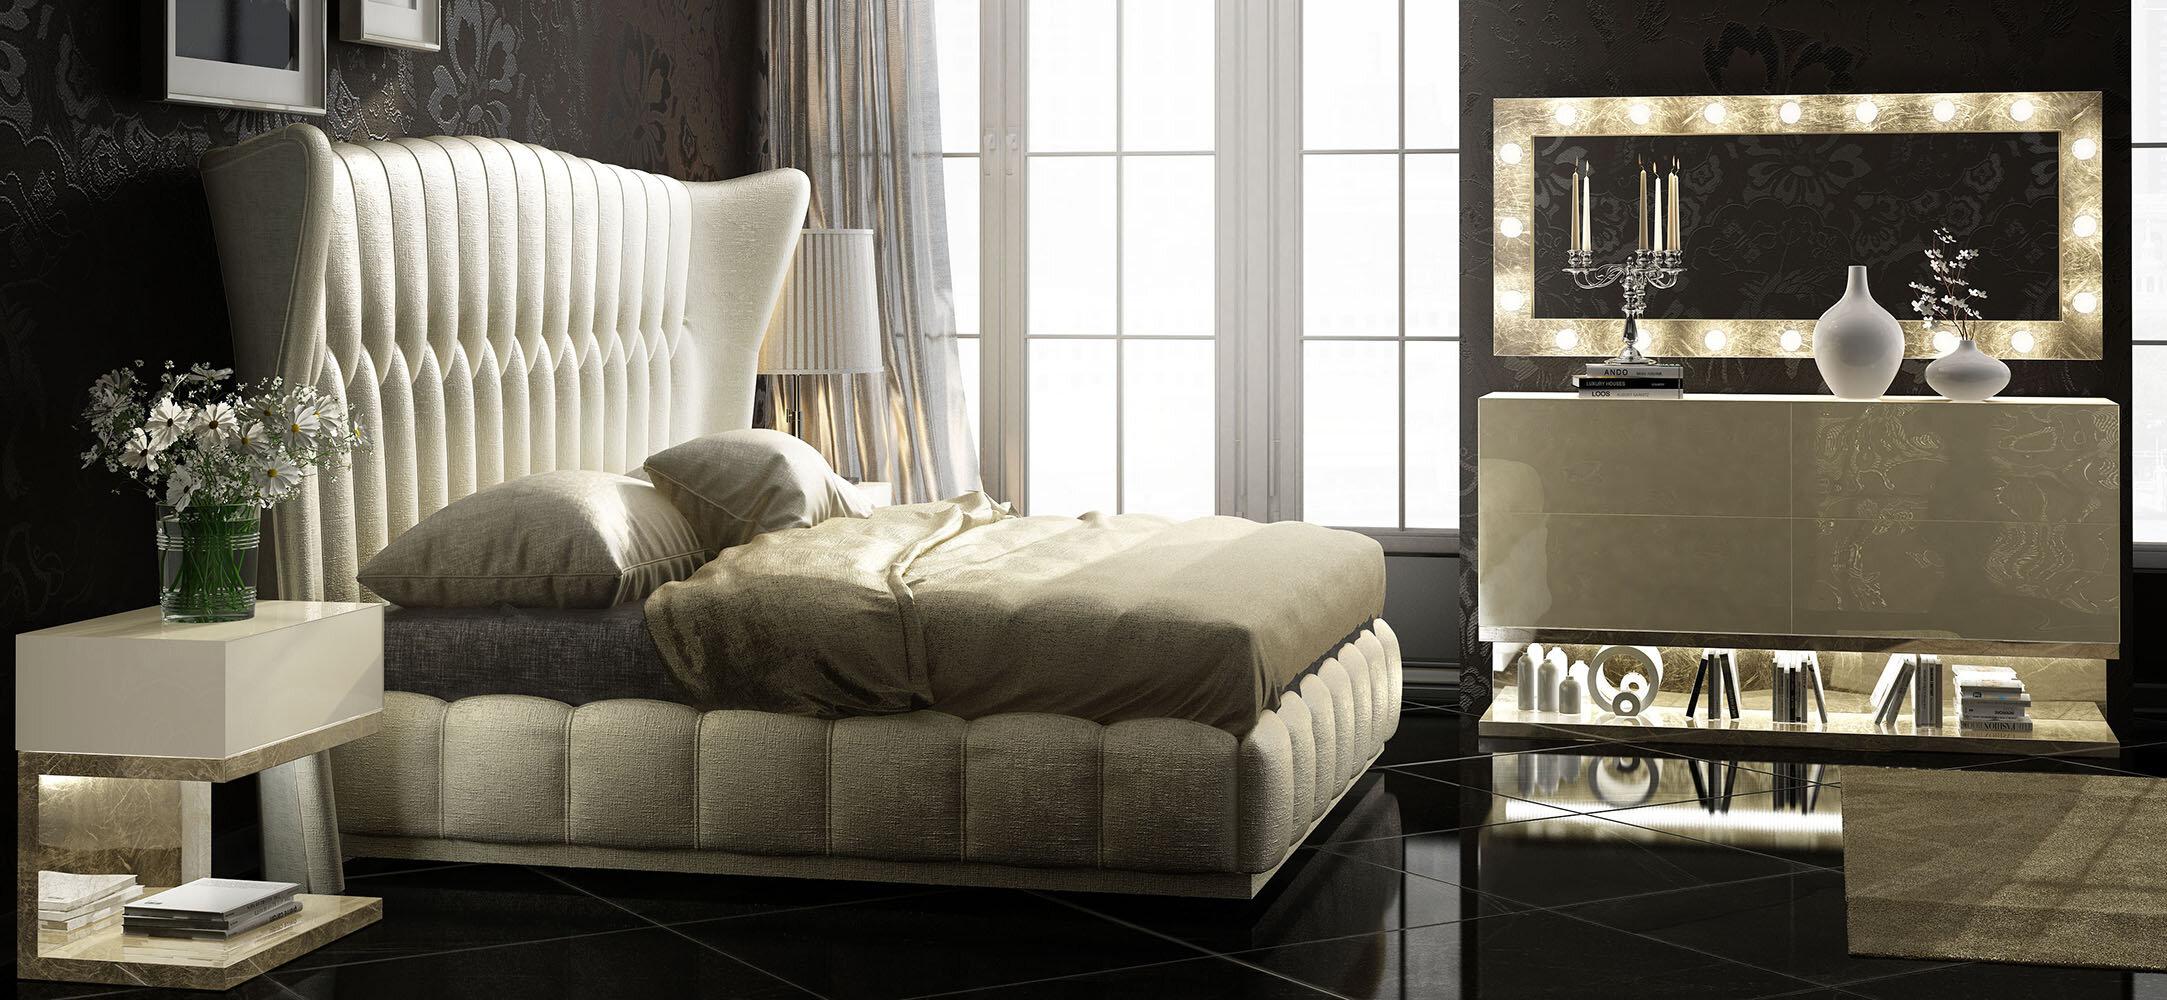 Hispania Home London Bedor43 Bedroom Set 5 Pieces